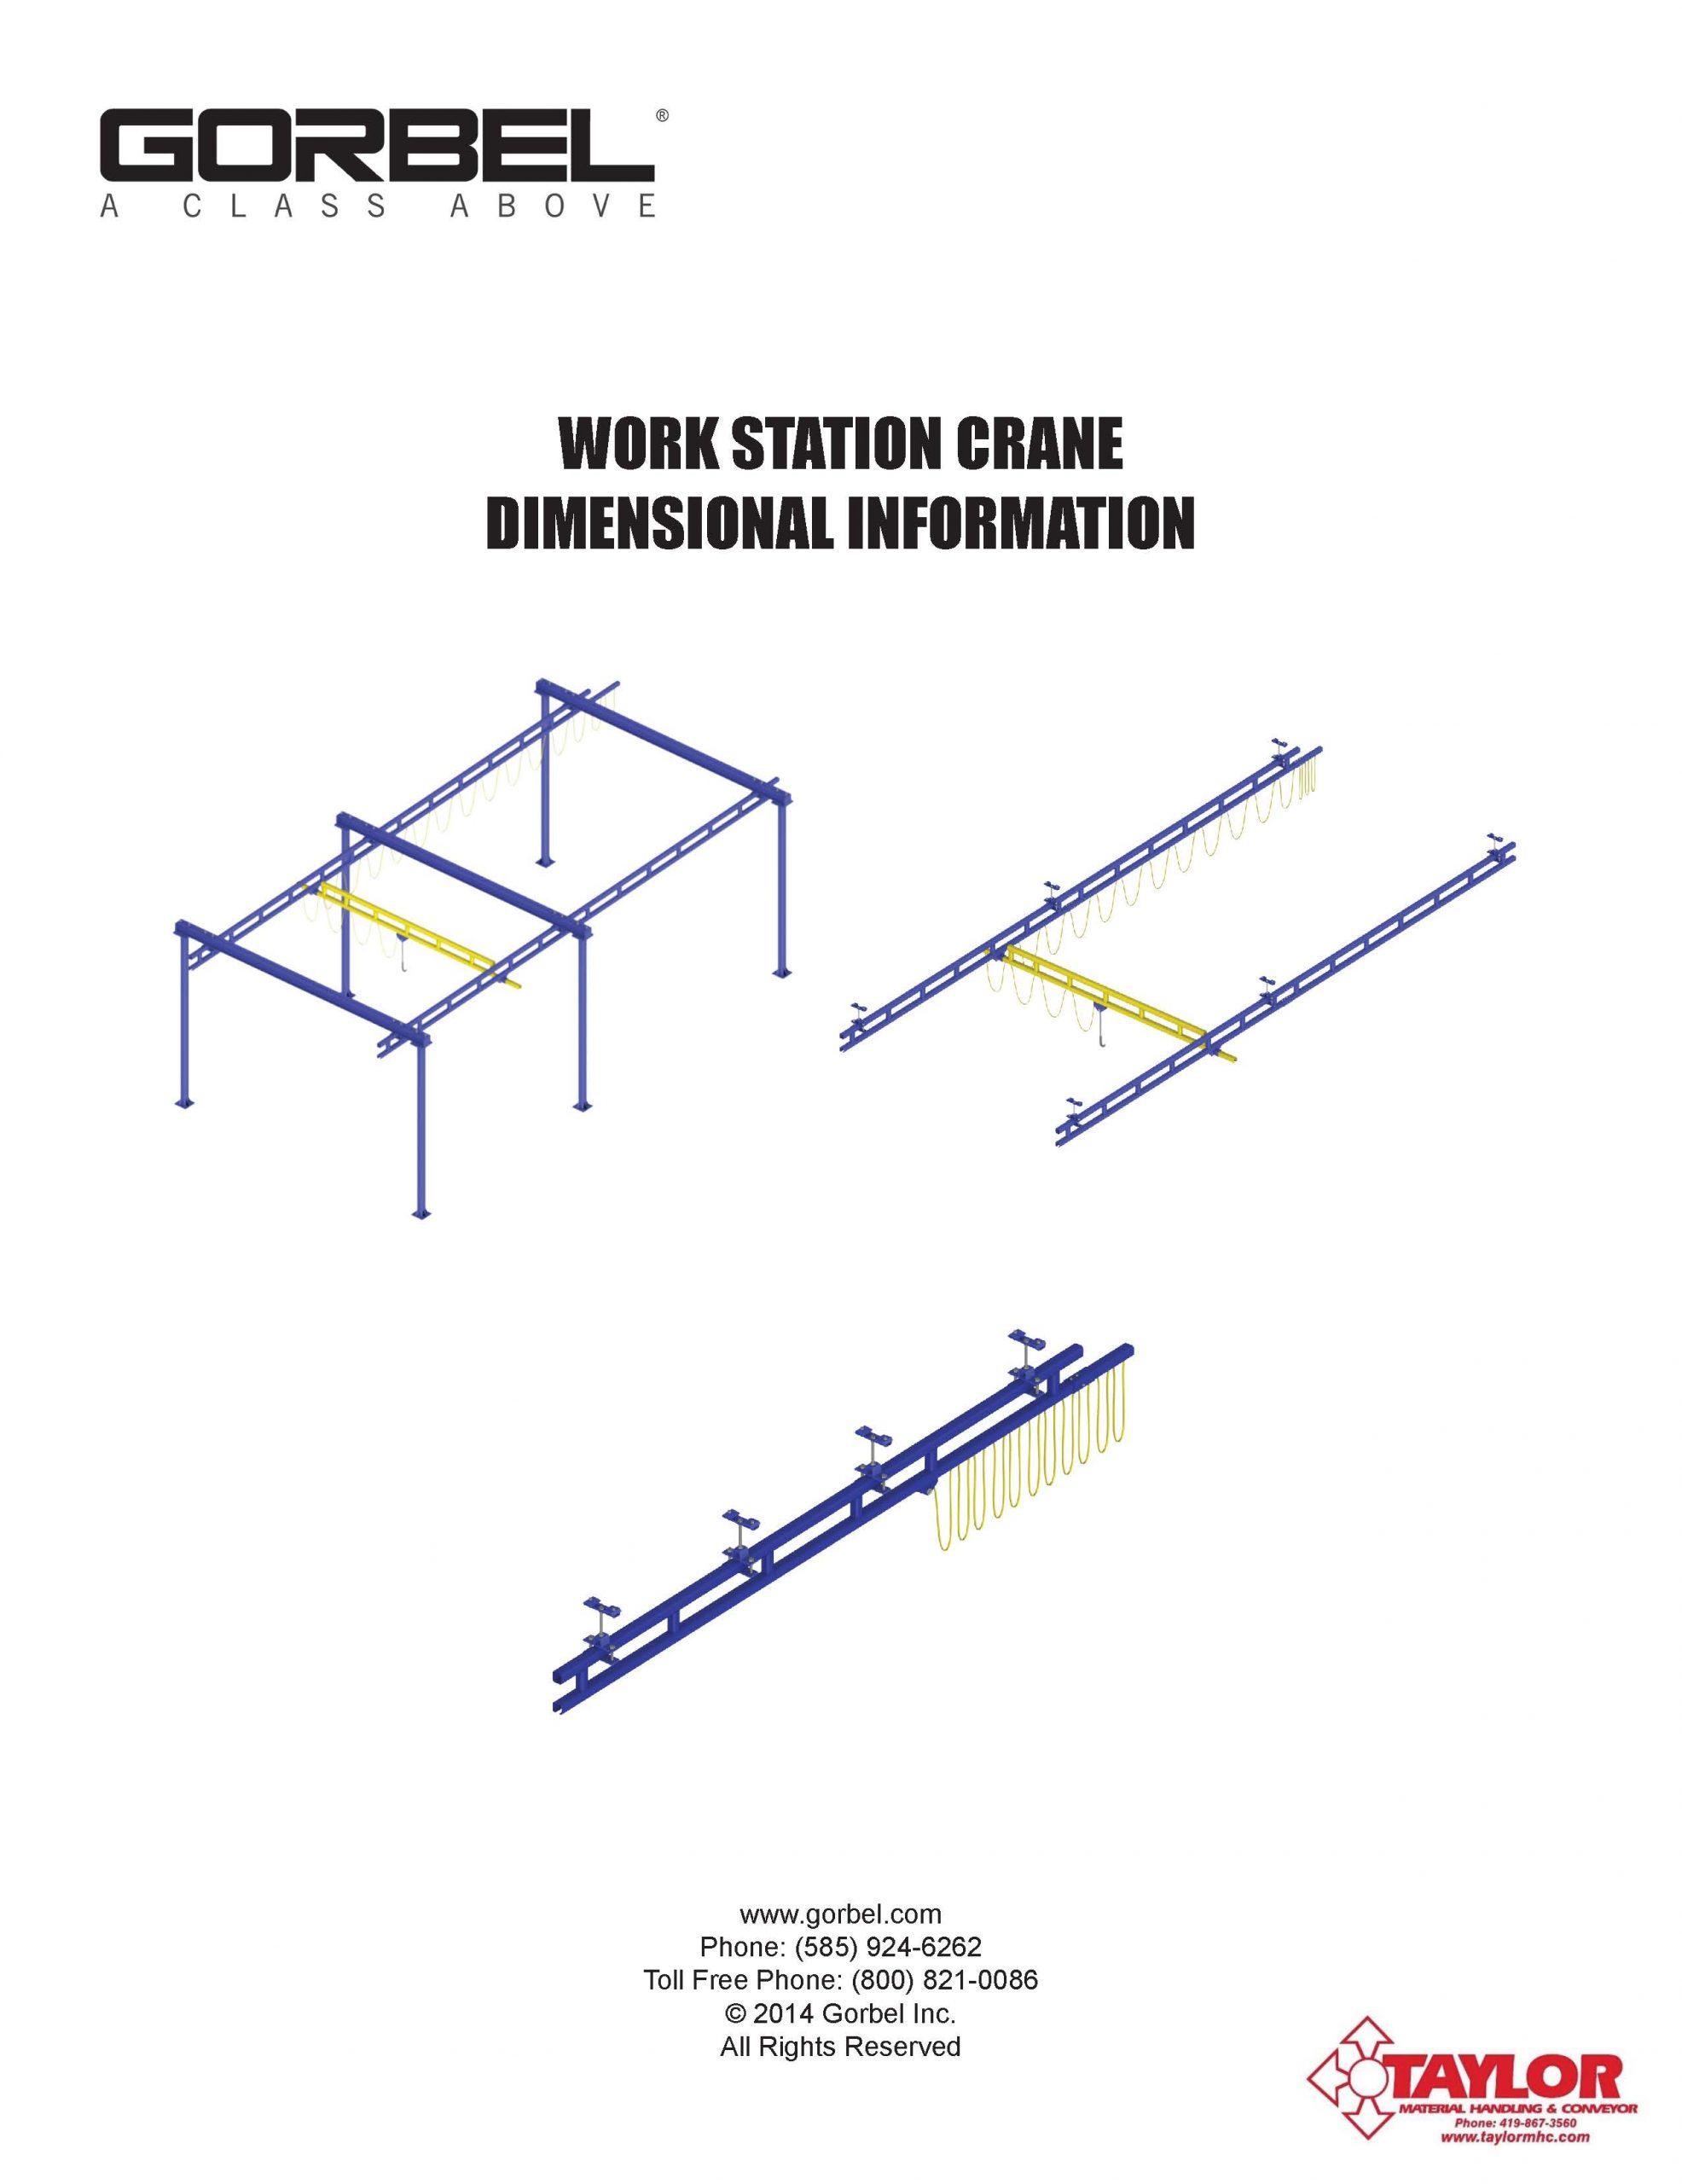 Workstation Crane Dimensional Information